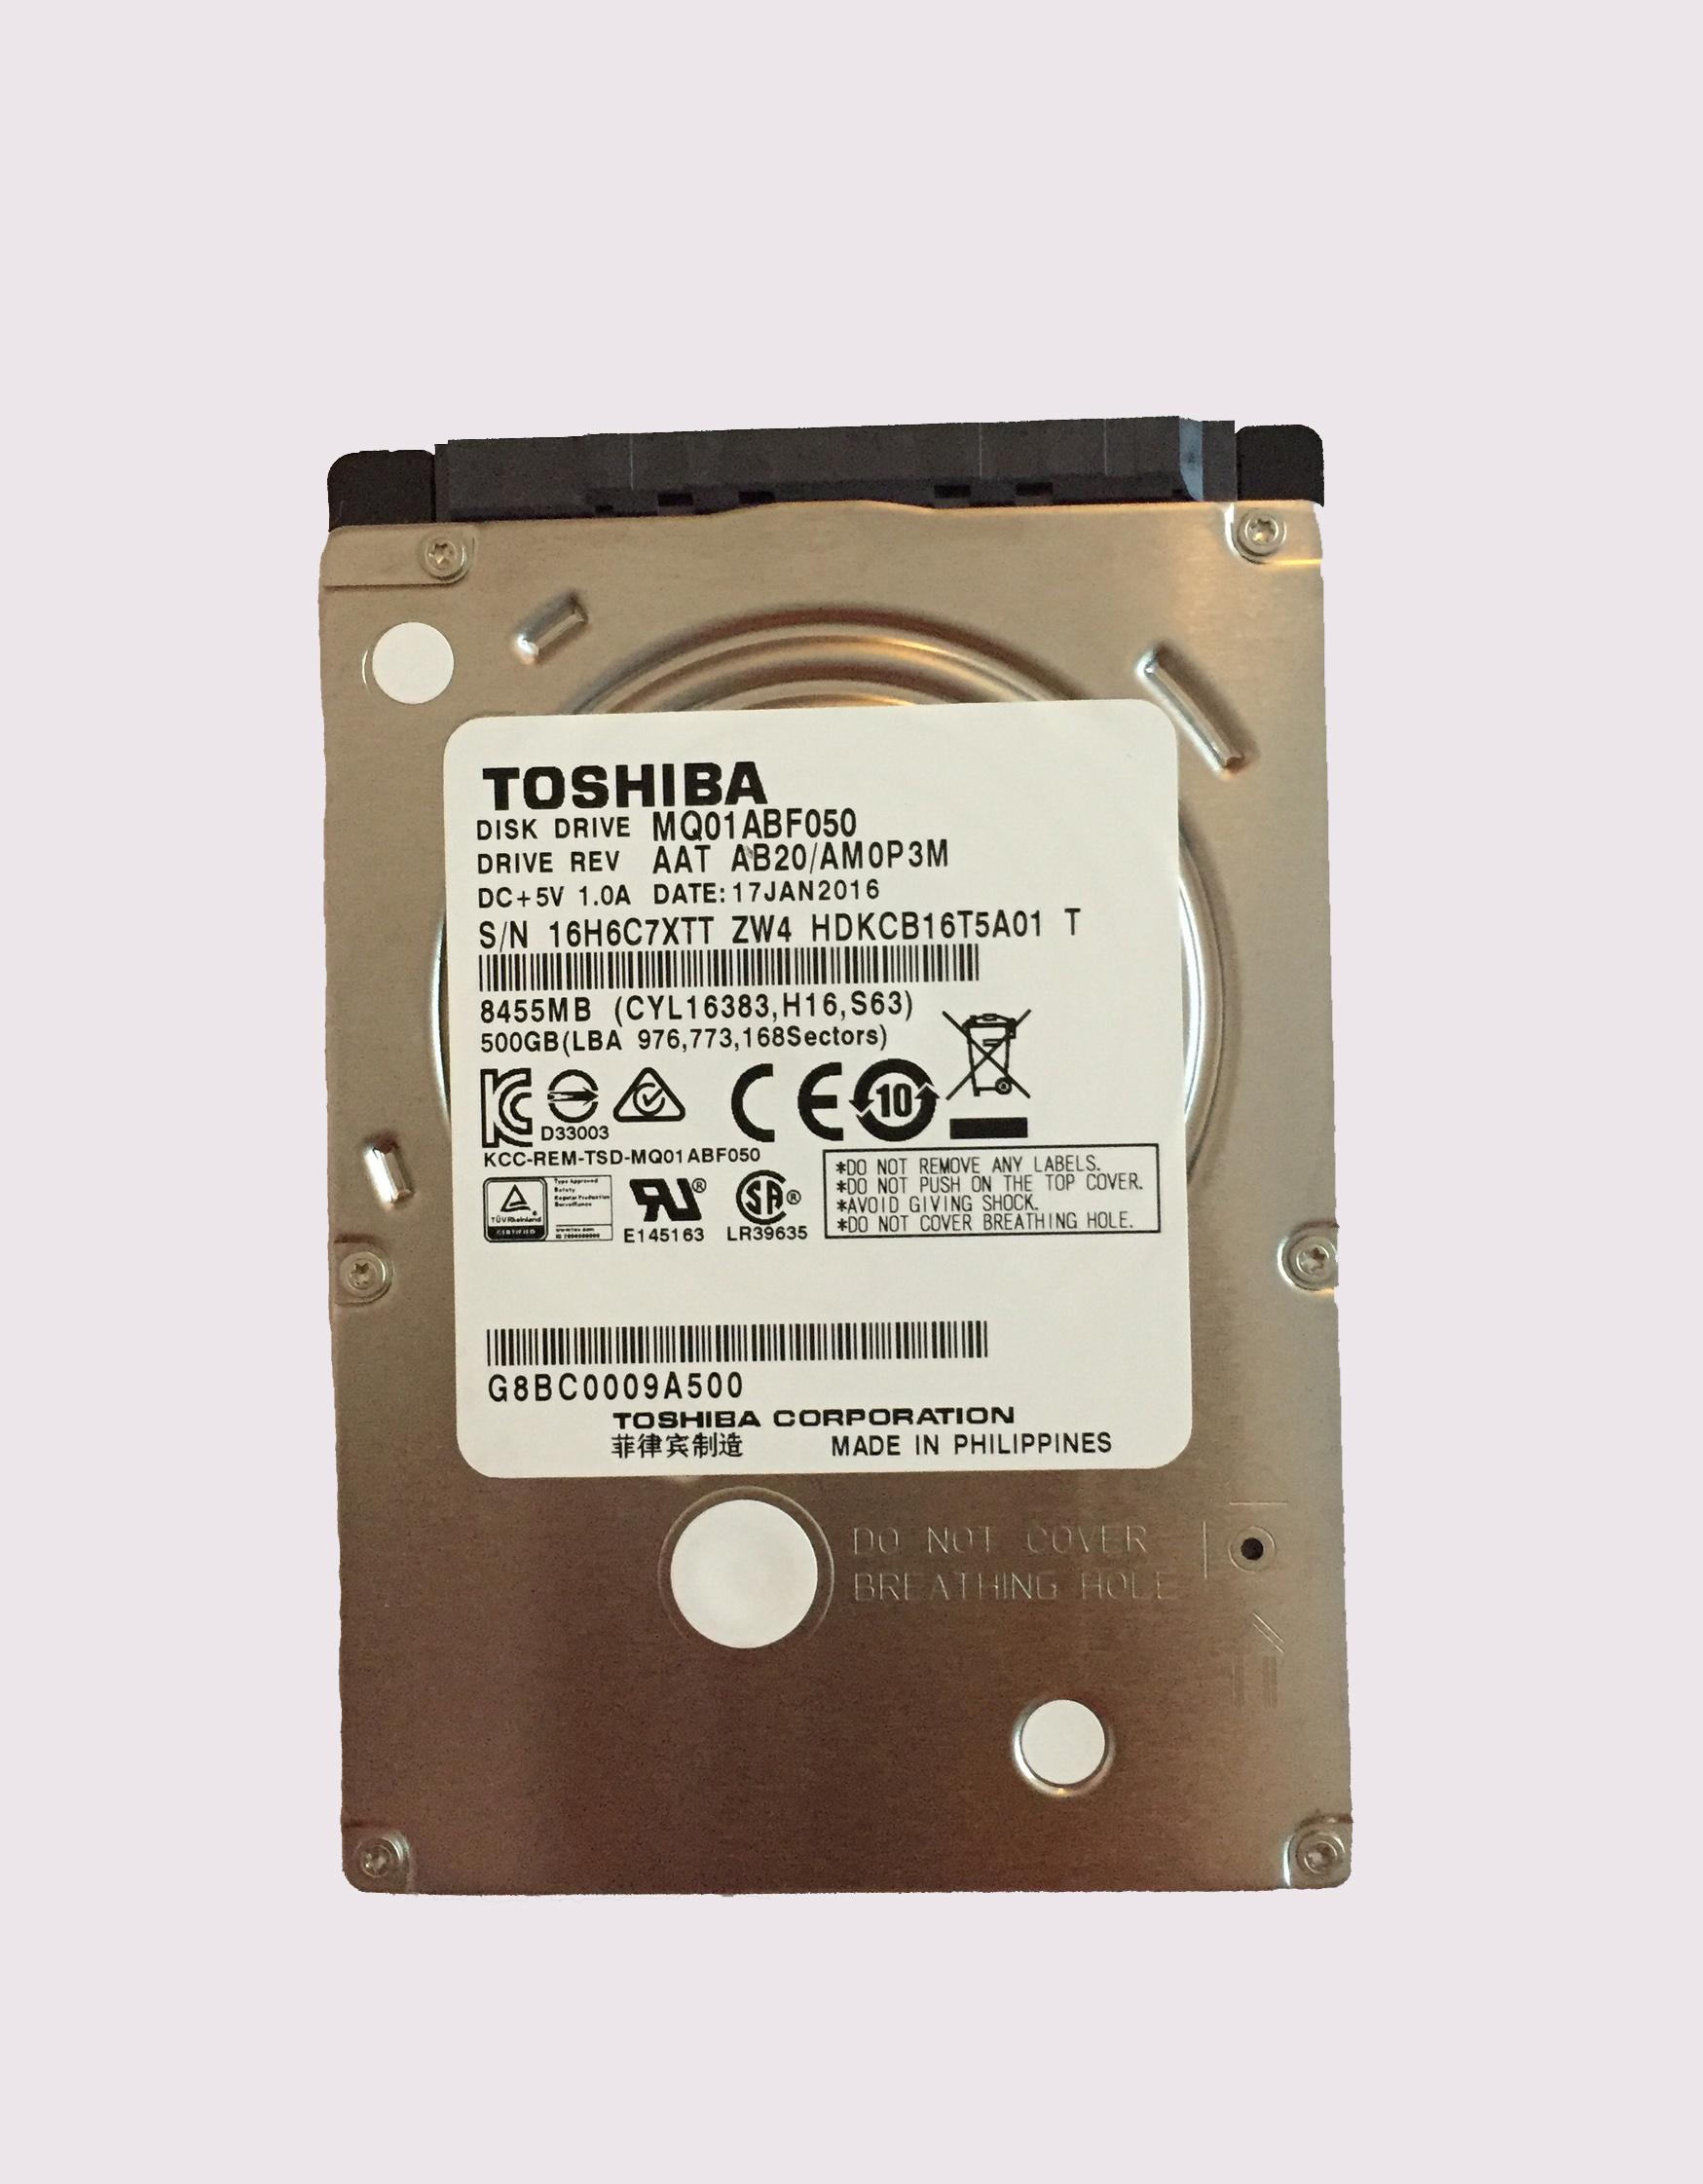 HDD mới - 500GB | Laptop Danh Phong